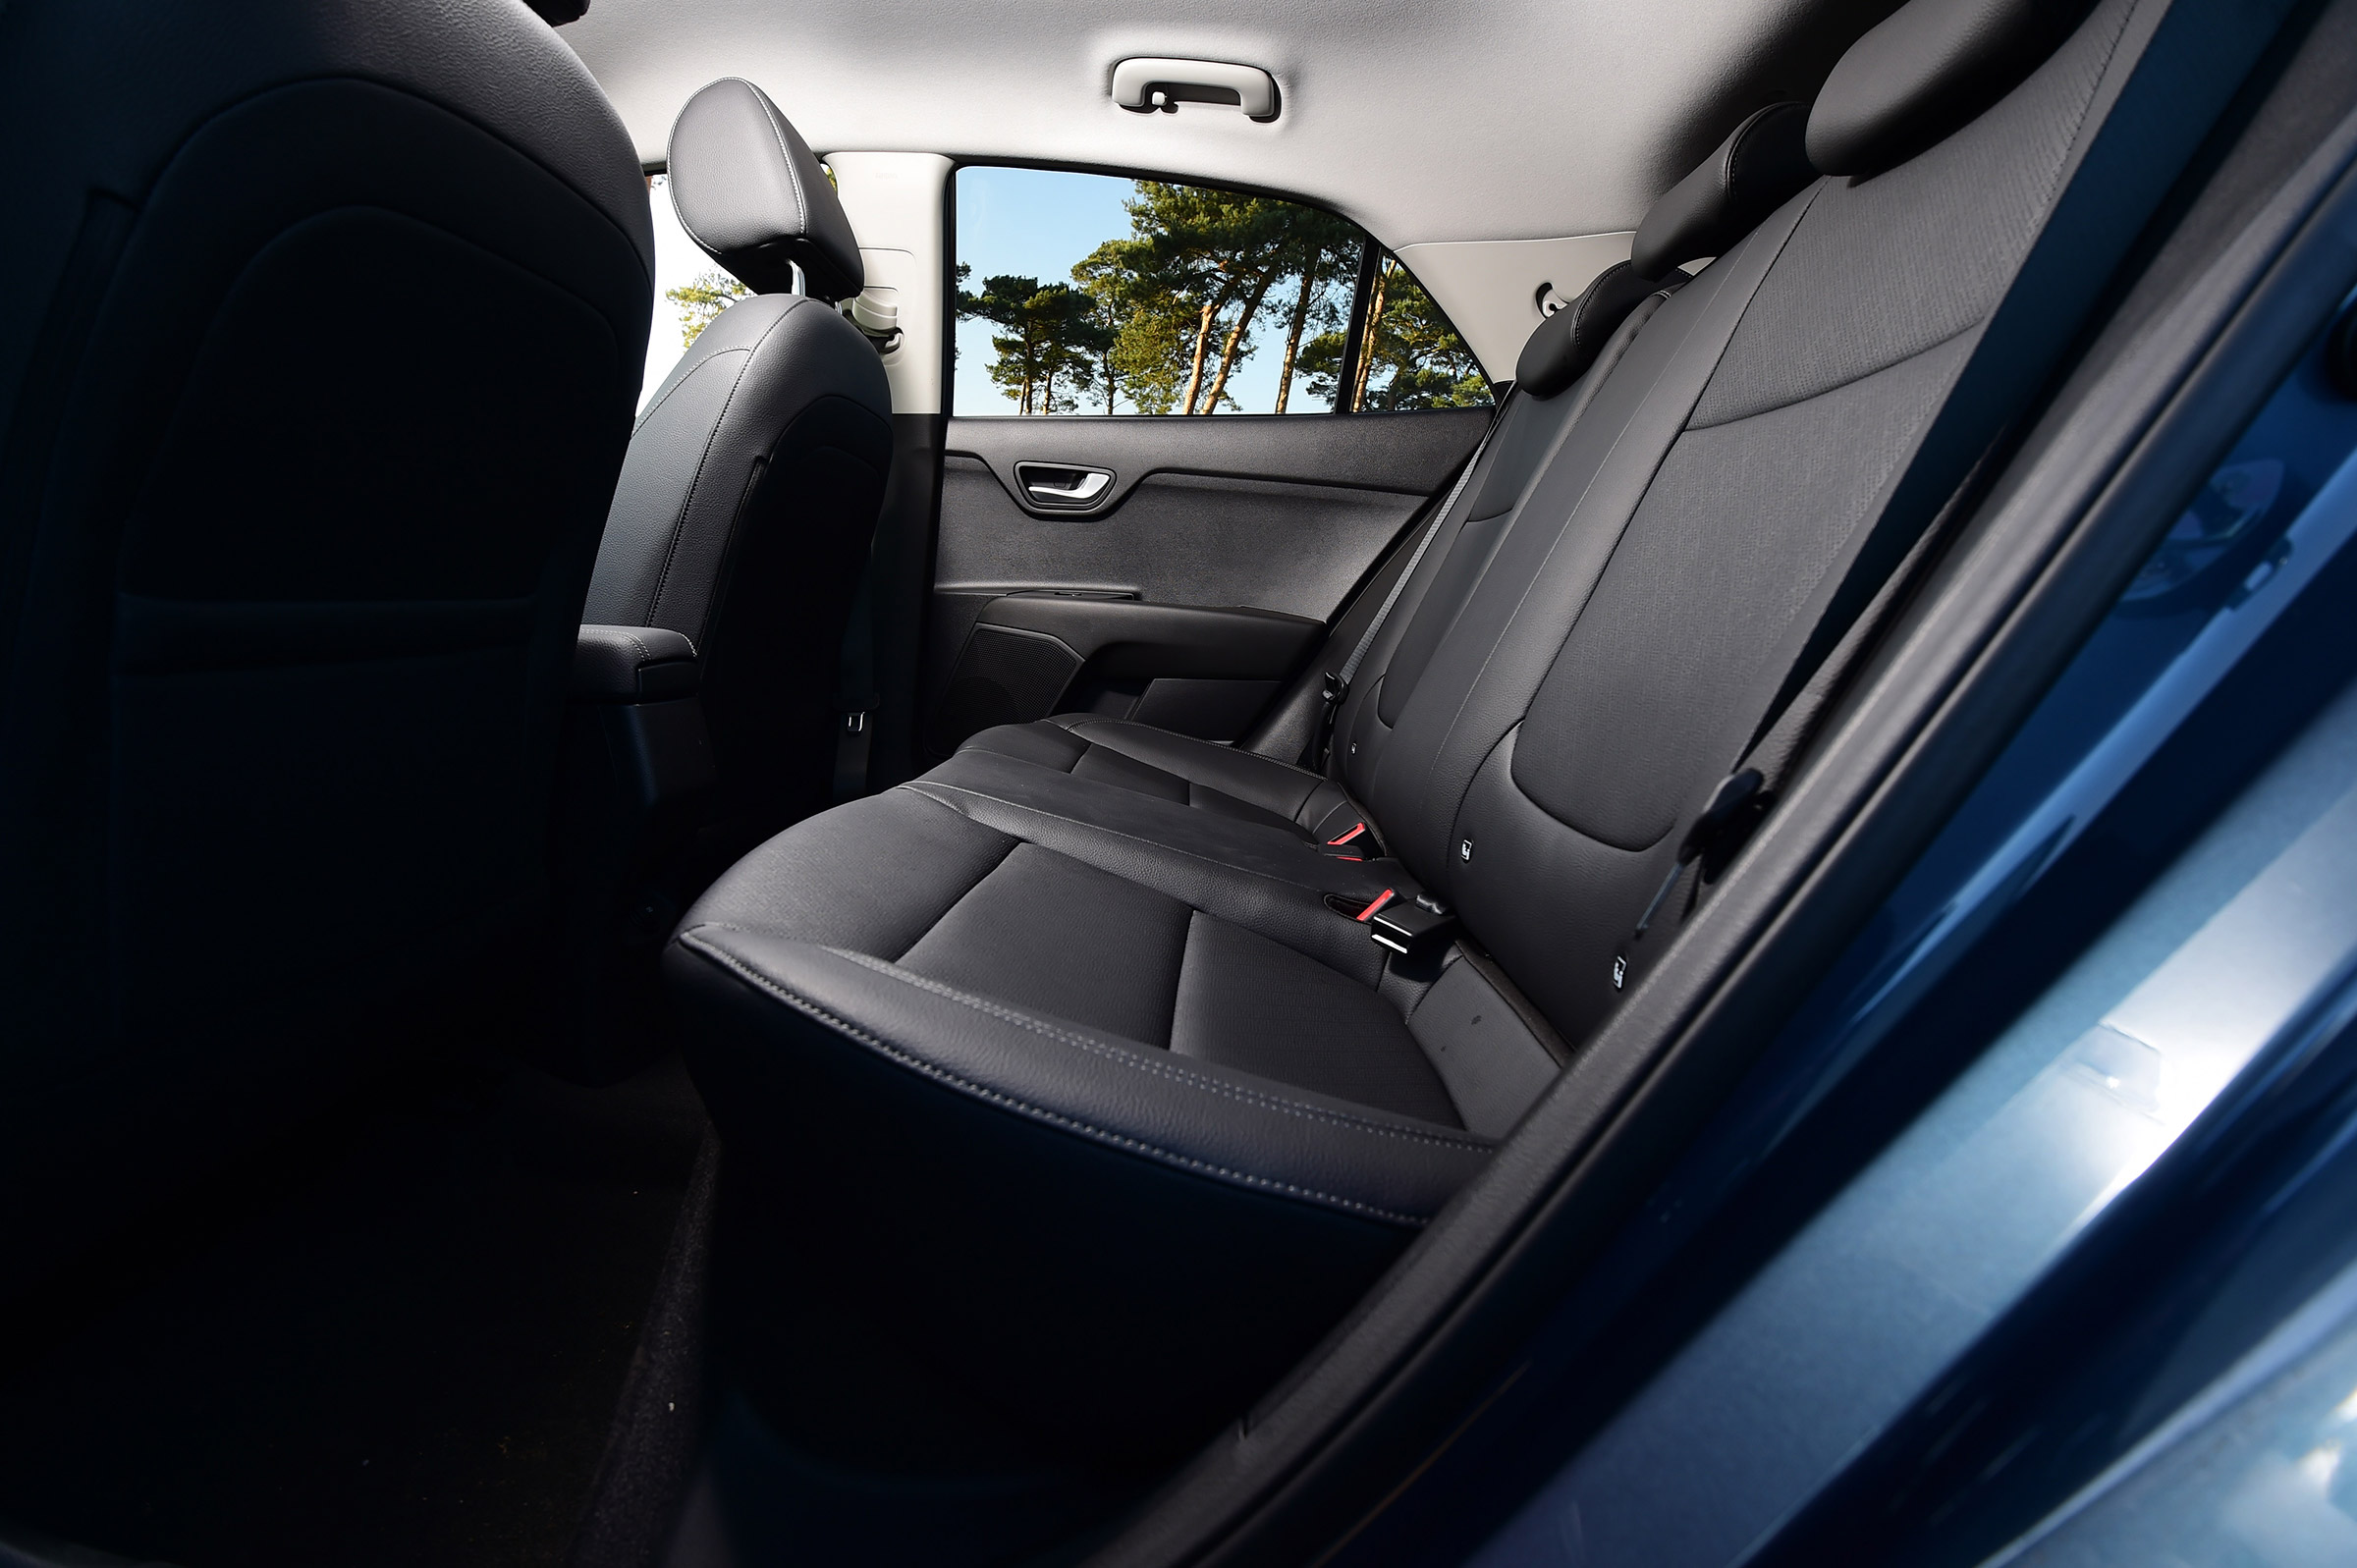 2017 Kia Rio Interior Seats Rear (Photo 14 of 49)